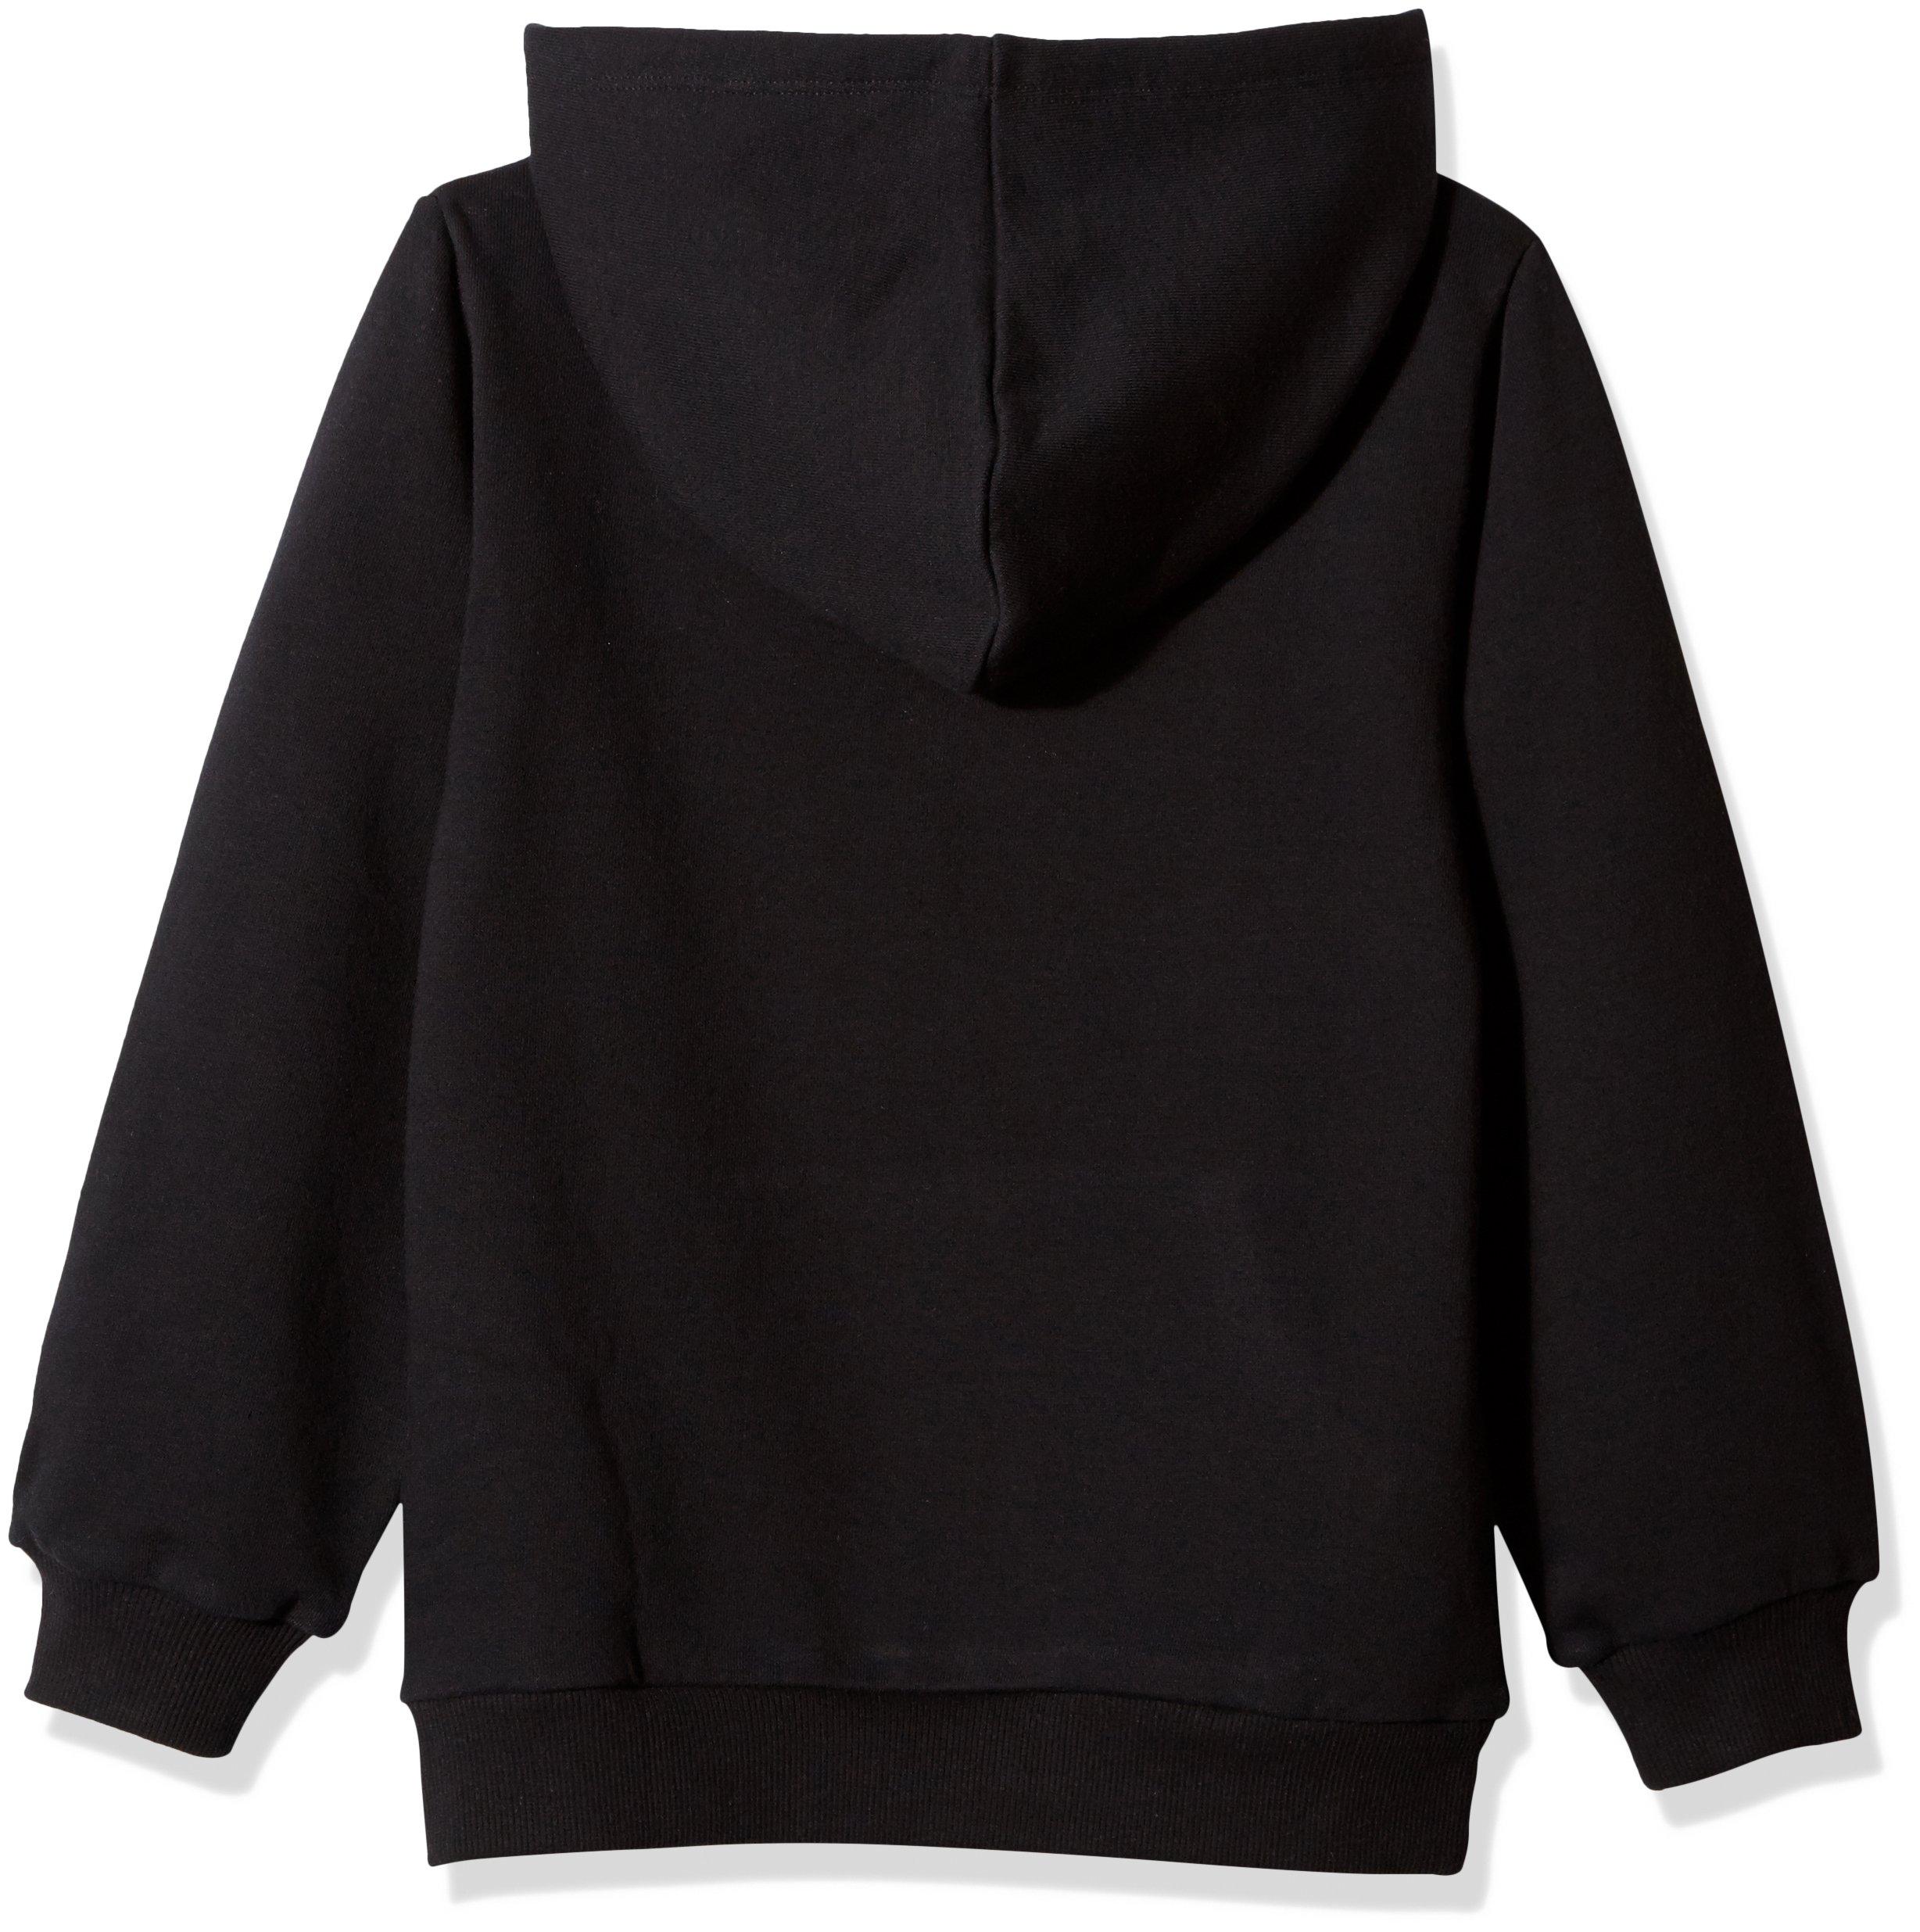 3-12Years JIAHONG Kids Soft Brushed Fleece Casual Basic Crewneck Sweatshirt for Boys or Girls